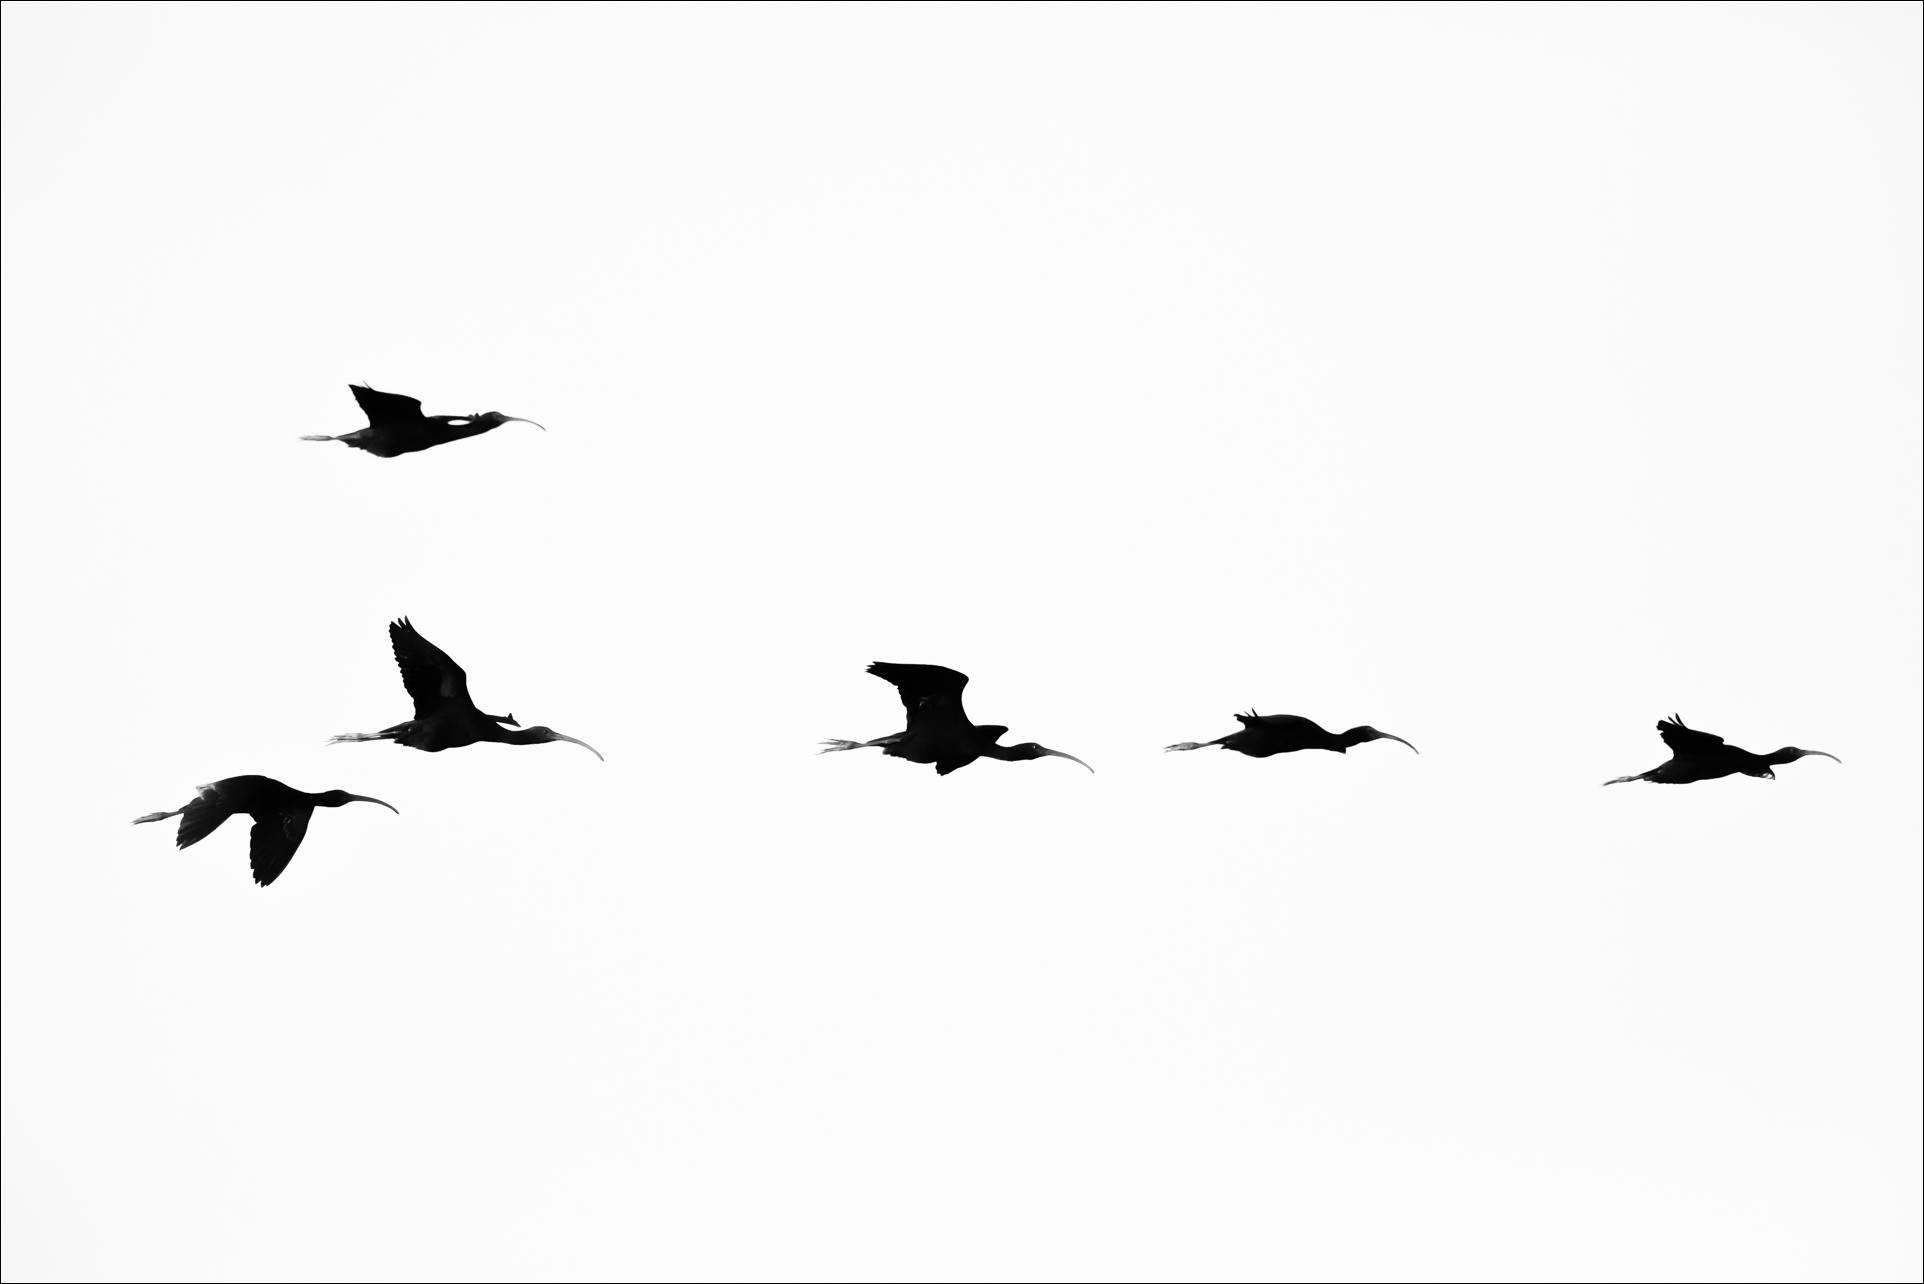 Bird flying away silhouette - photo#3